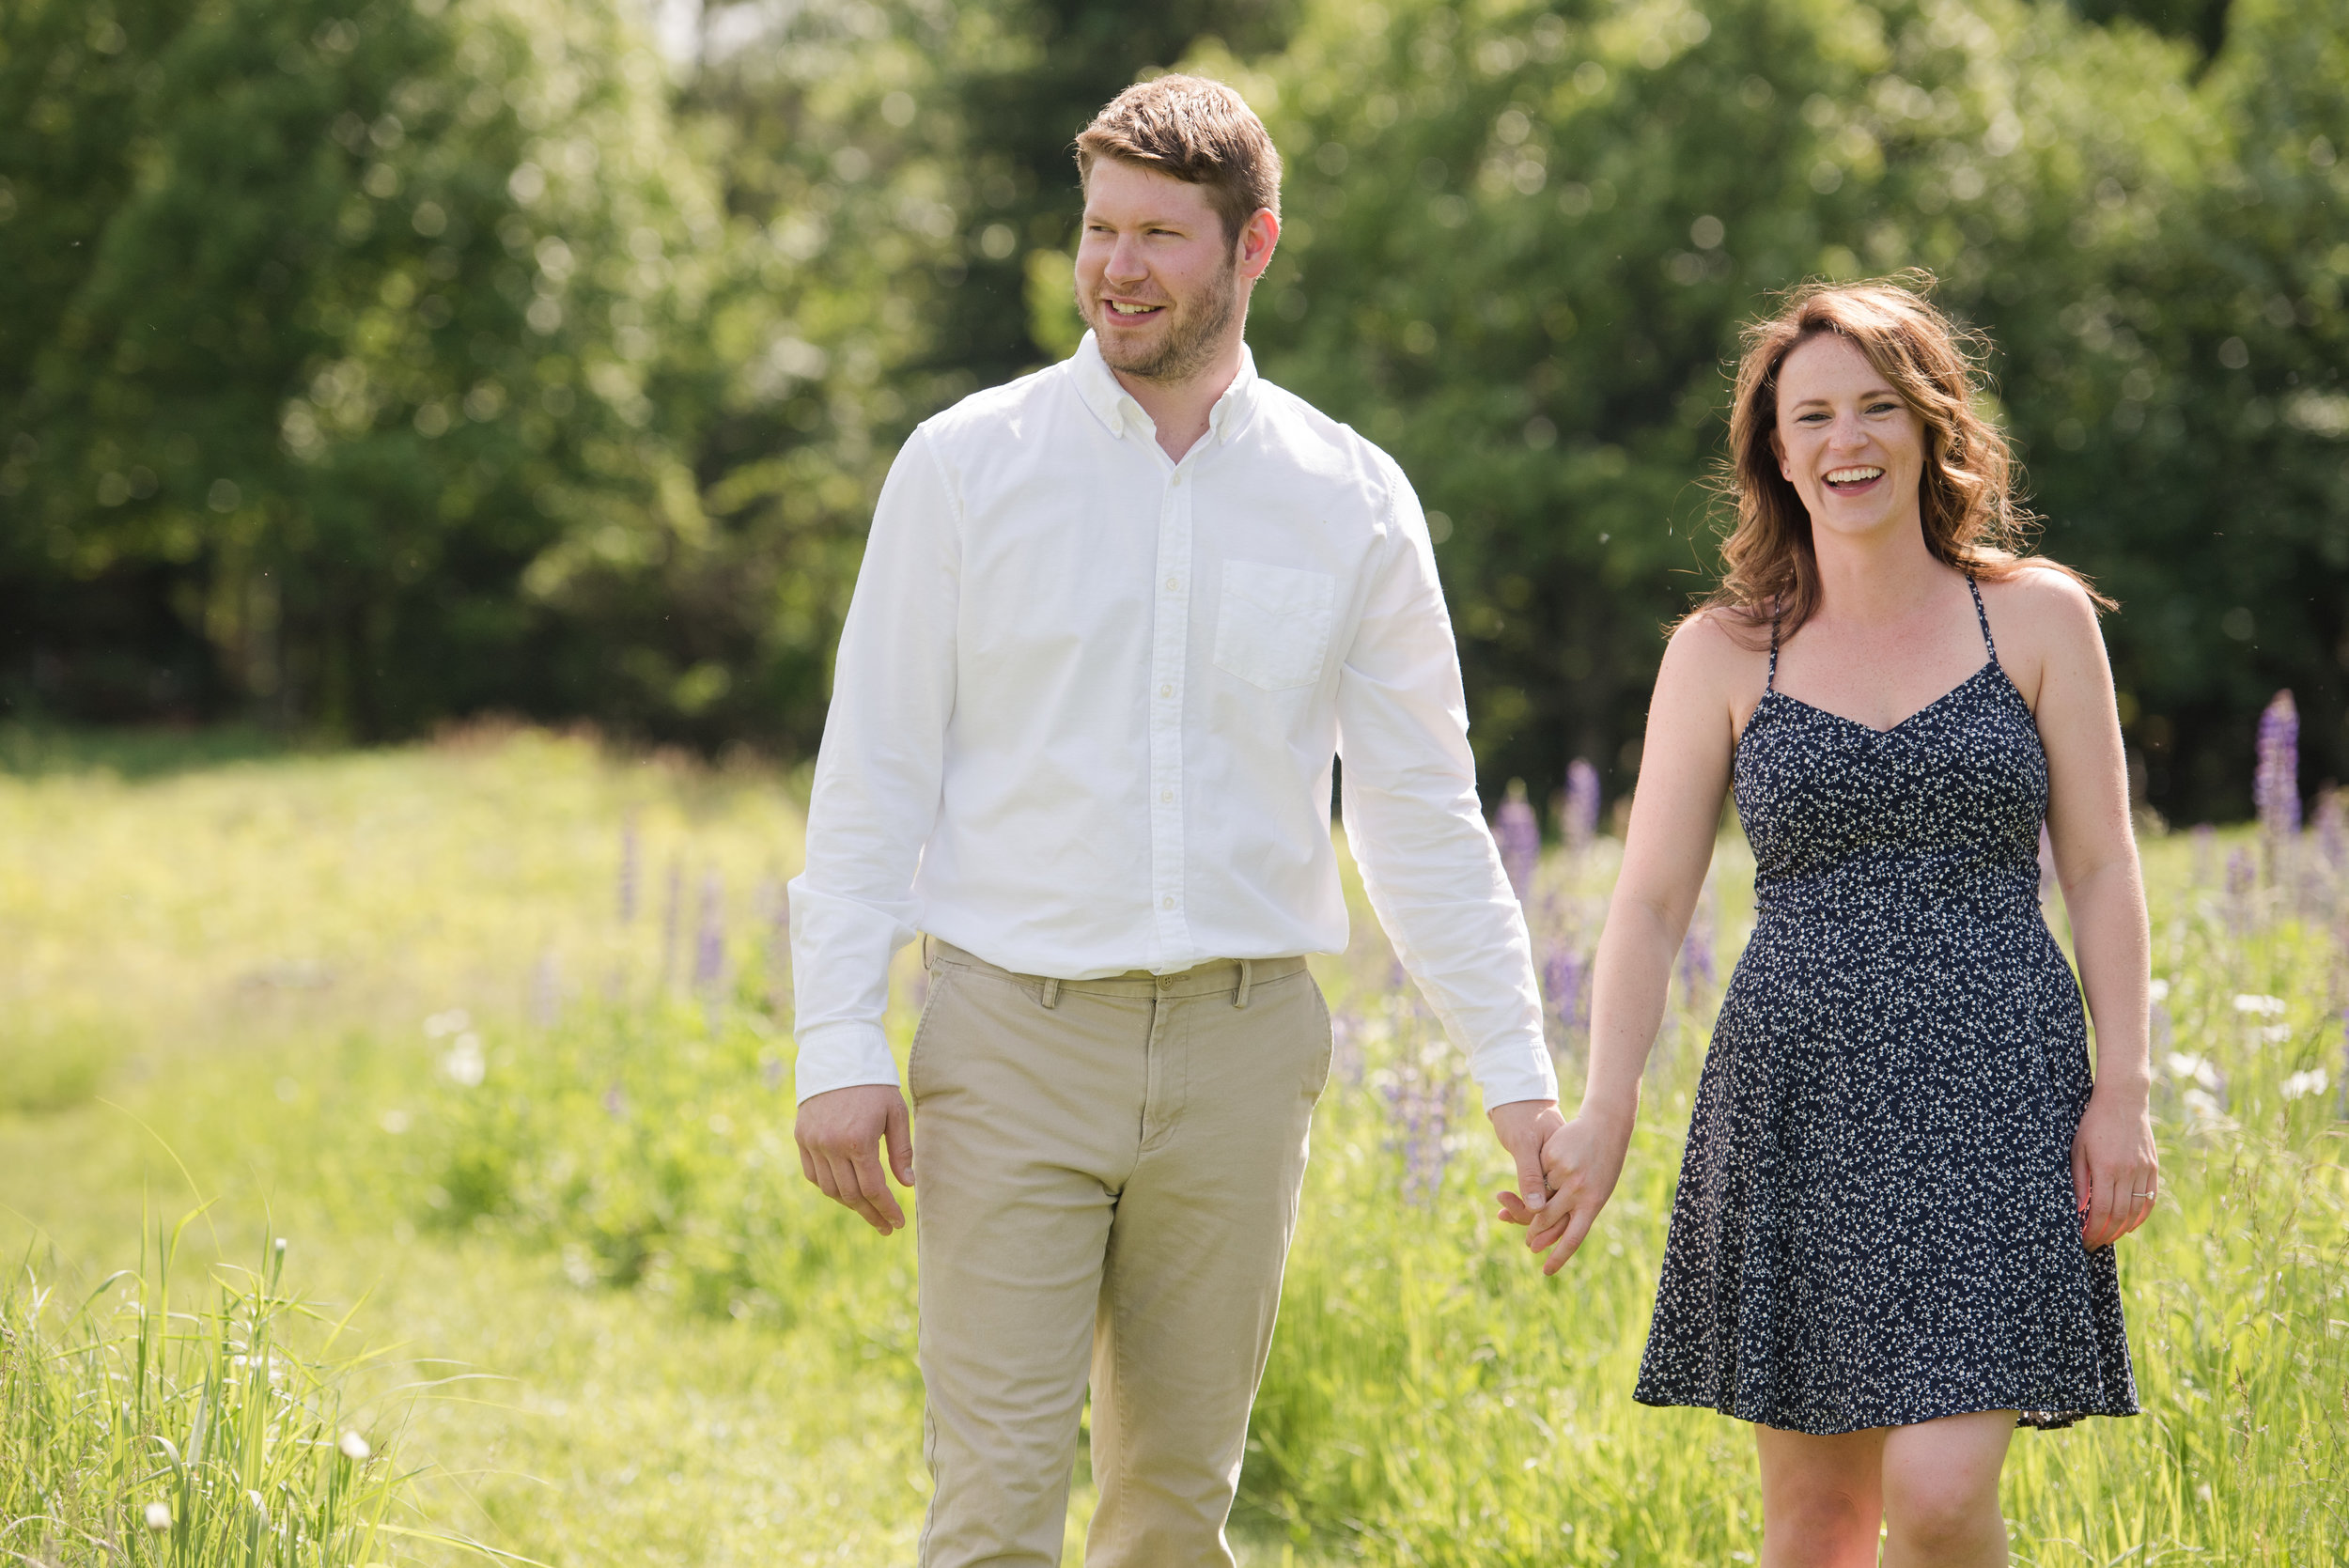 GALLERY-2019-6-9 Kaitlin, Justin & Liam Engagement 0648 87.jpg